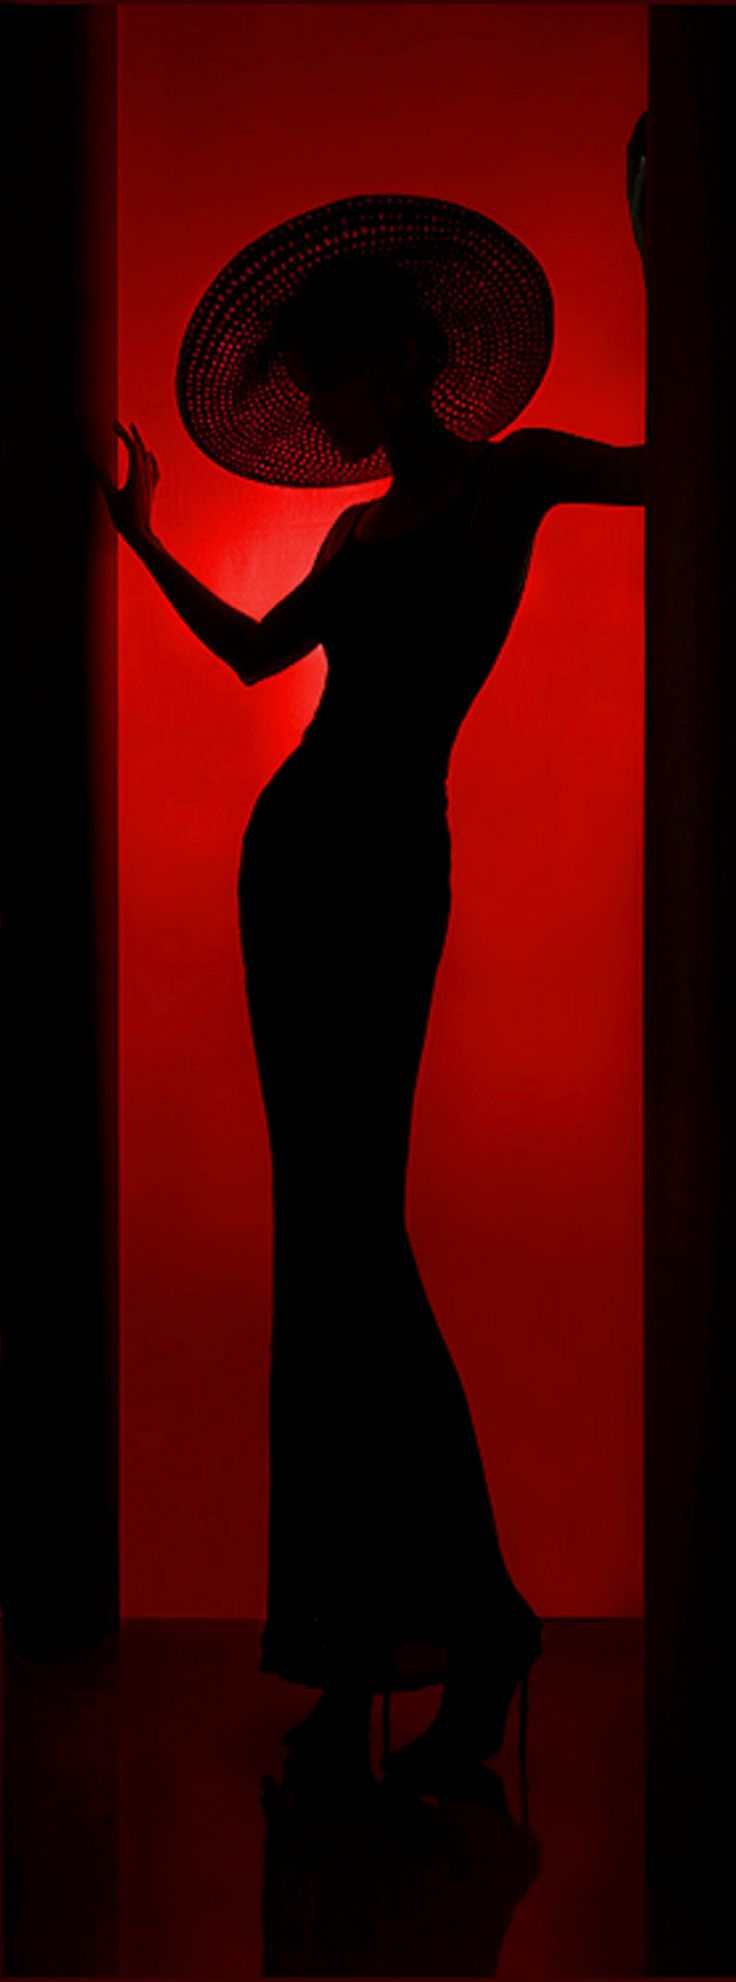 Deco silhouette - Photo by Ilya Rashap - https://500px.com/rashap